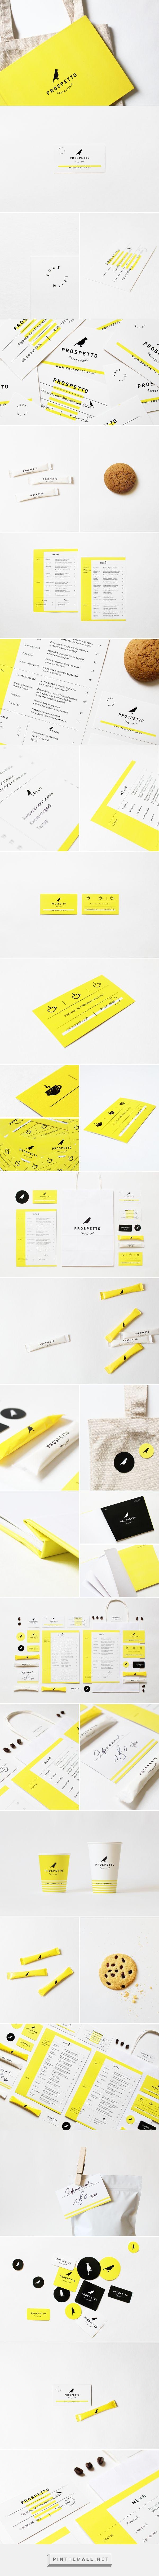 Prospetto Caffetteria Branding and Menu Design by Daria Stetsenko | Fivestar Branding Agency – Design and Branding Agency & Curated Inspiration Gallery